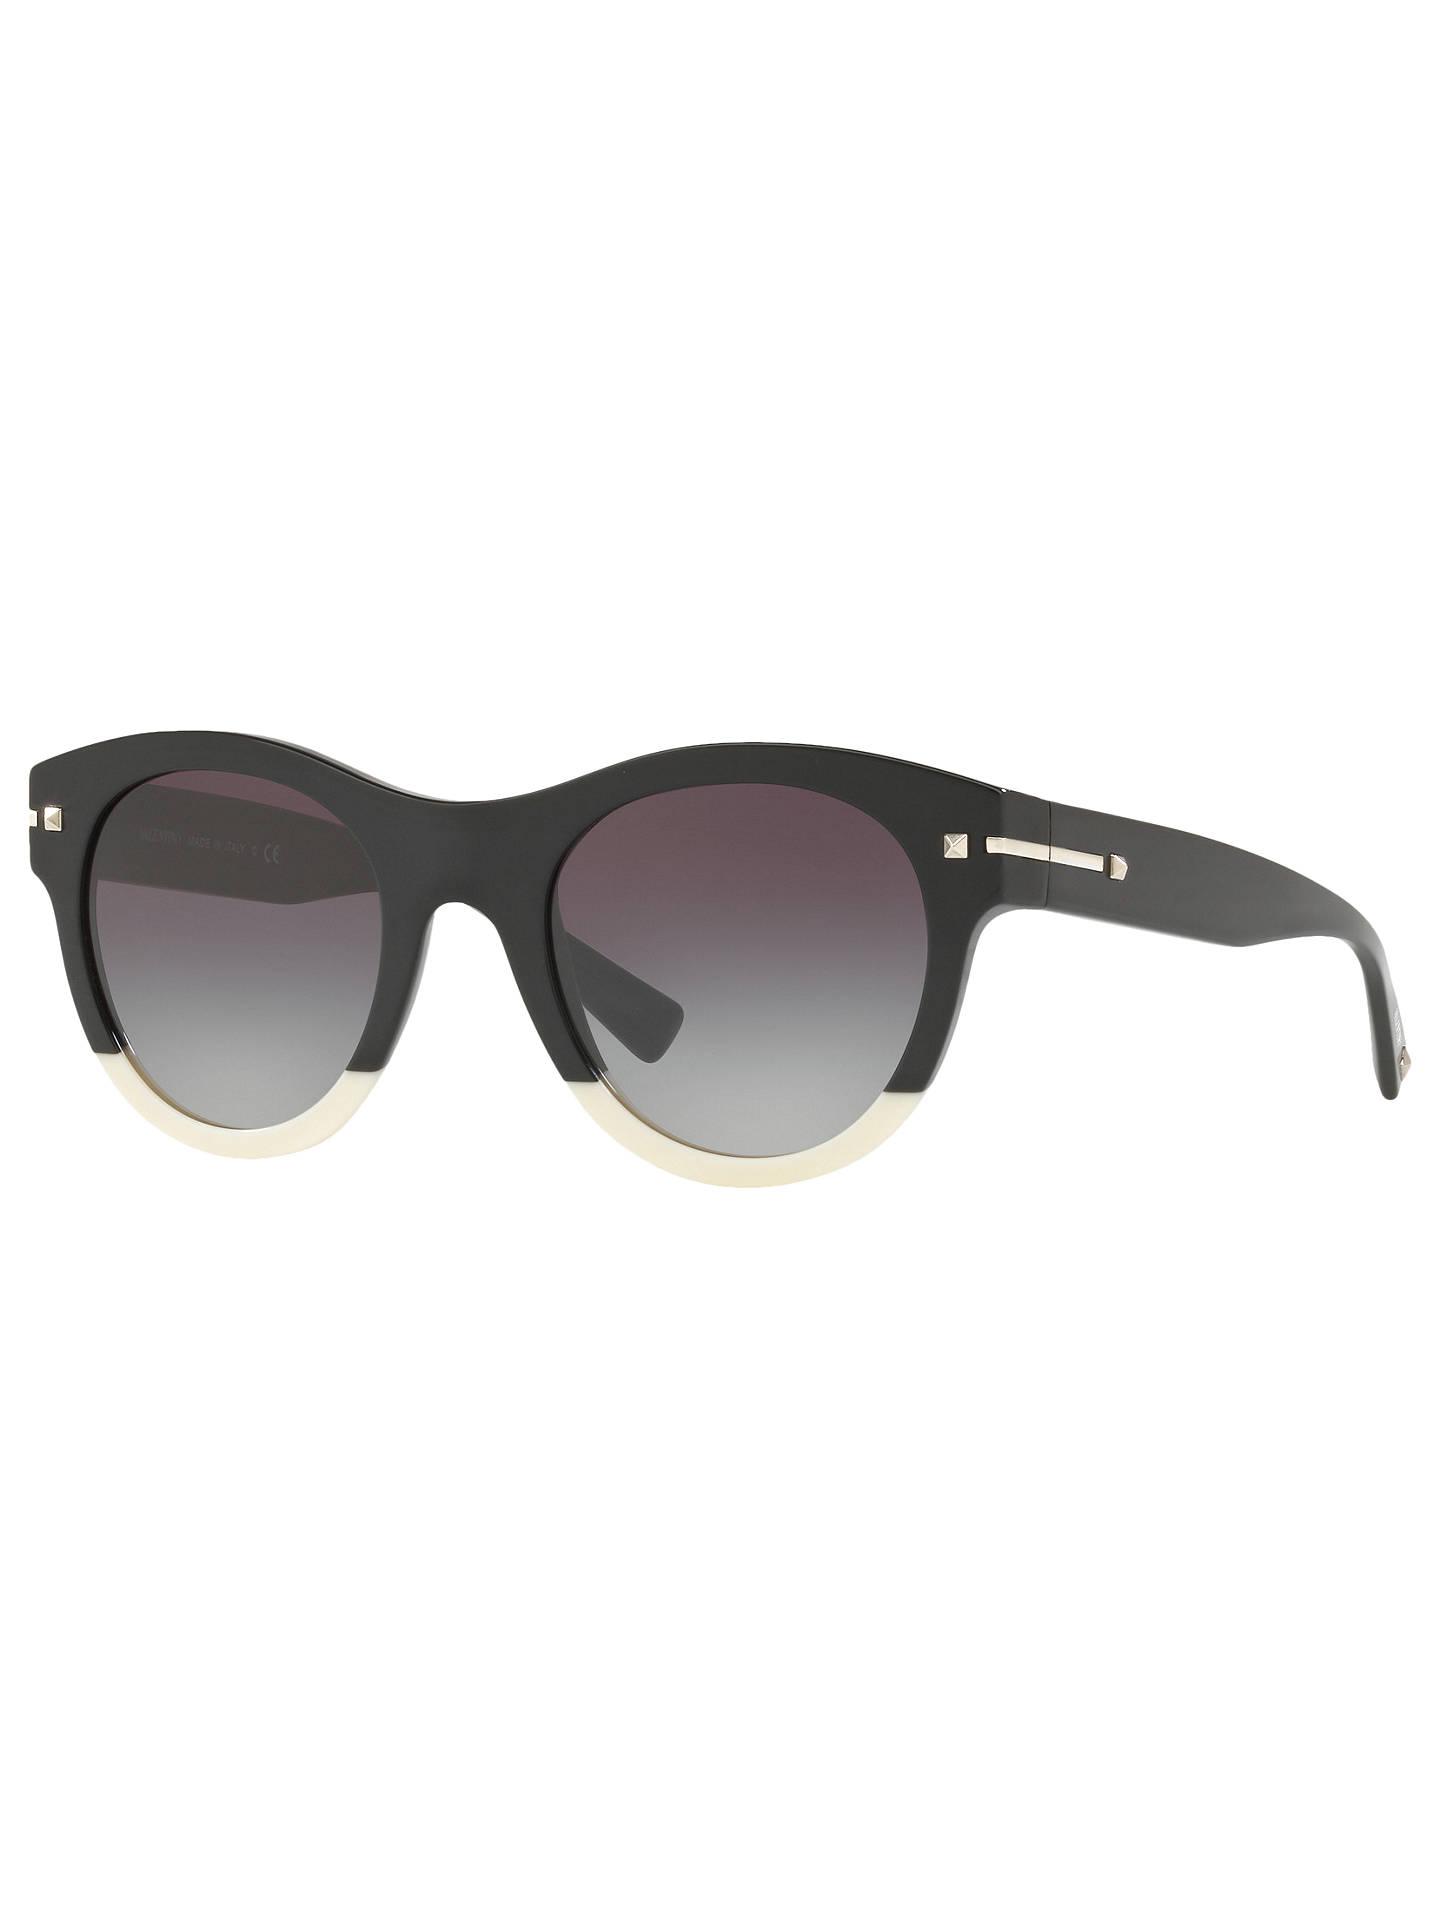 92b77a29b4 Valentino VA4020 Oval Sunglasses at John Lewis   Partners